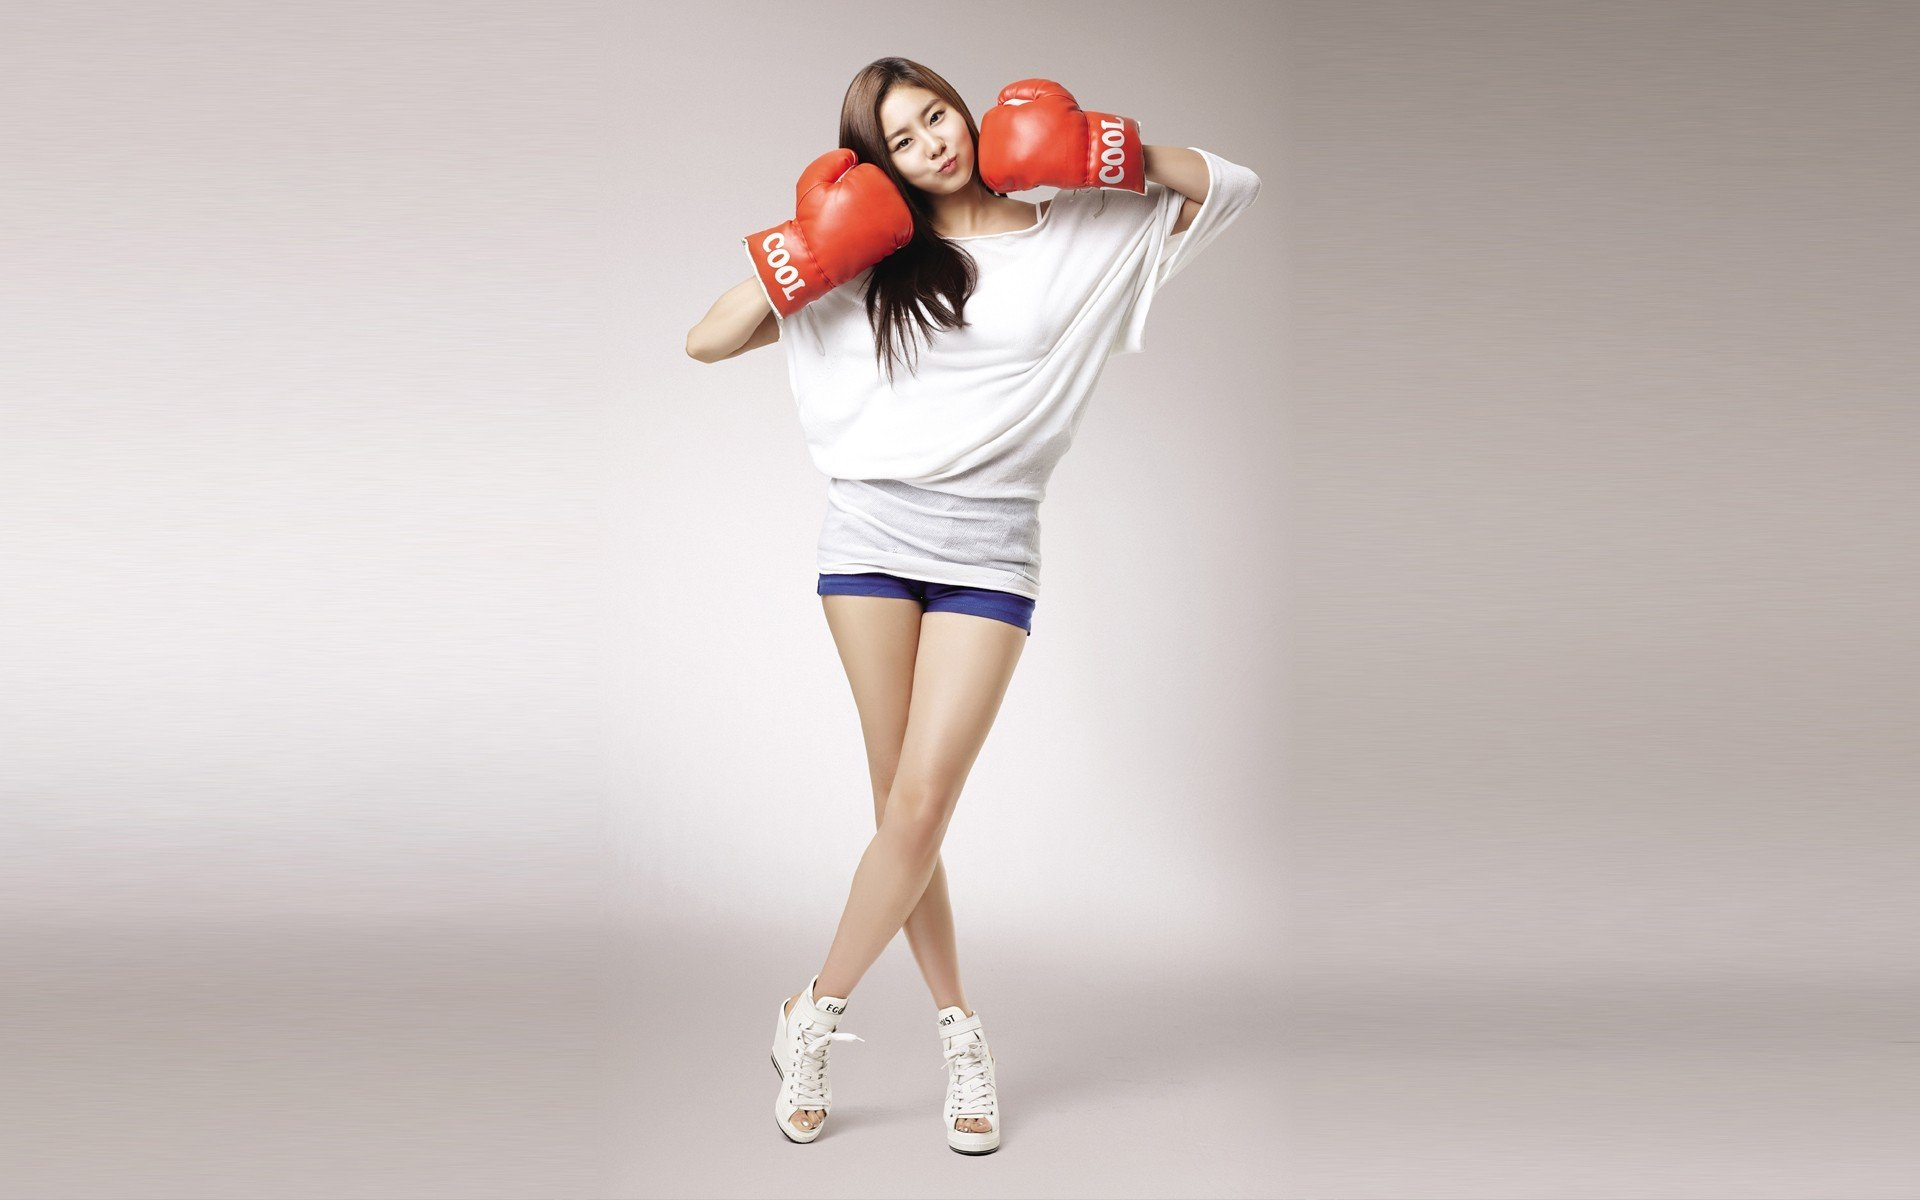 Sport Girl Wallpaper 1920x1080: Women, Model, South Korea, Boxing Gloves HD Wallpapers